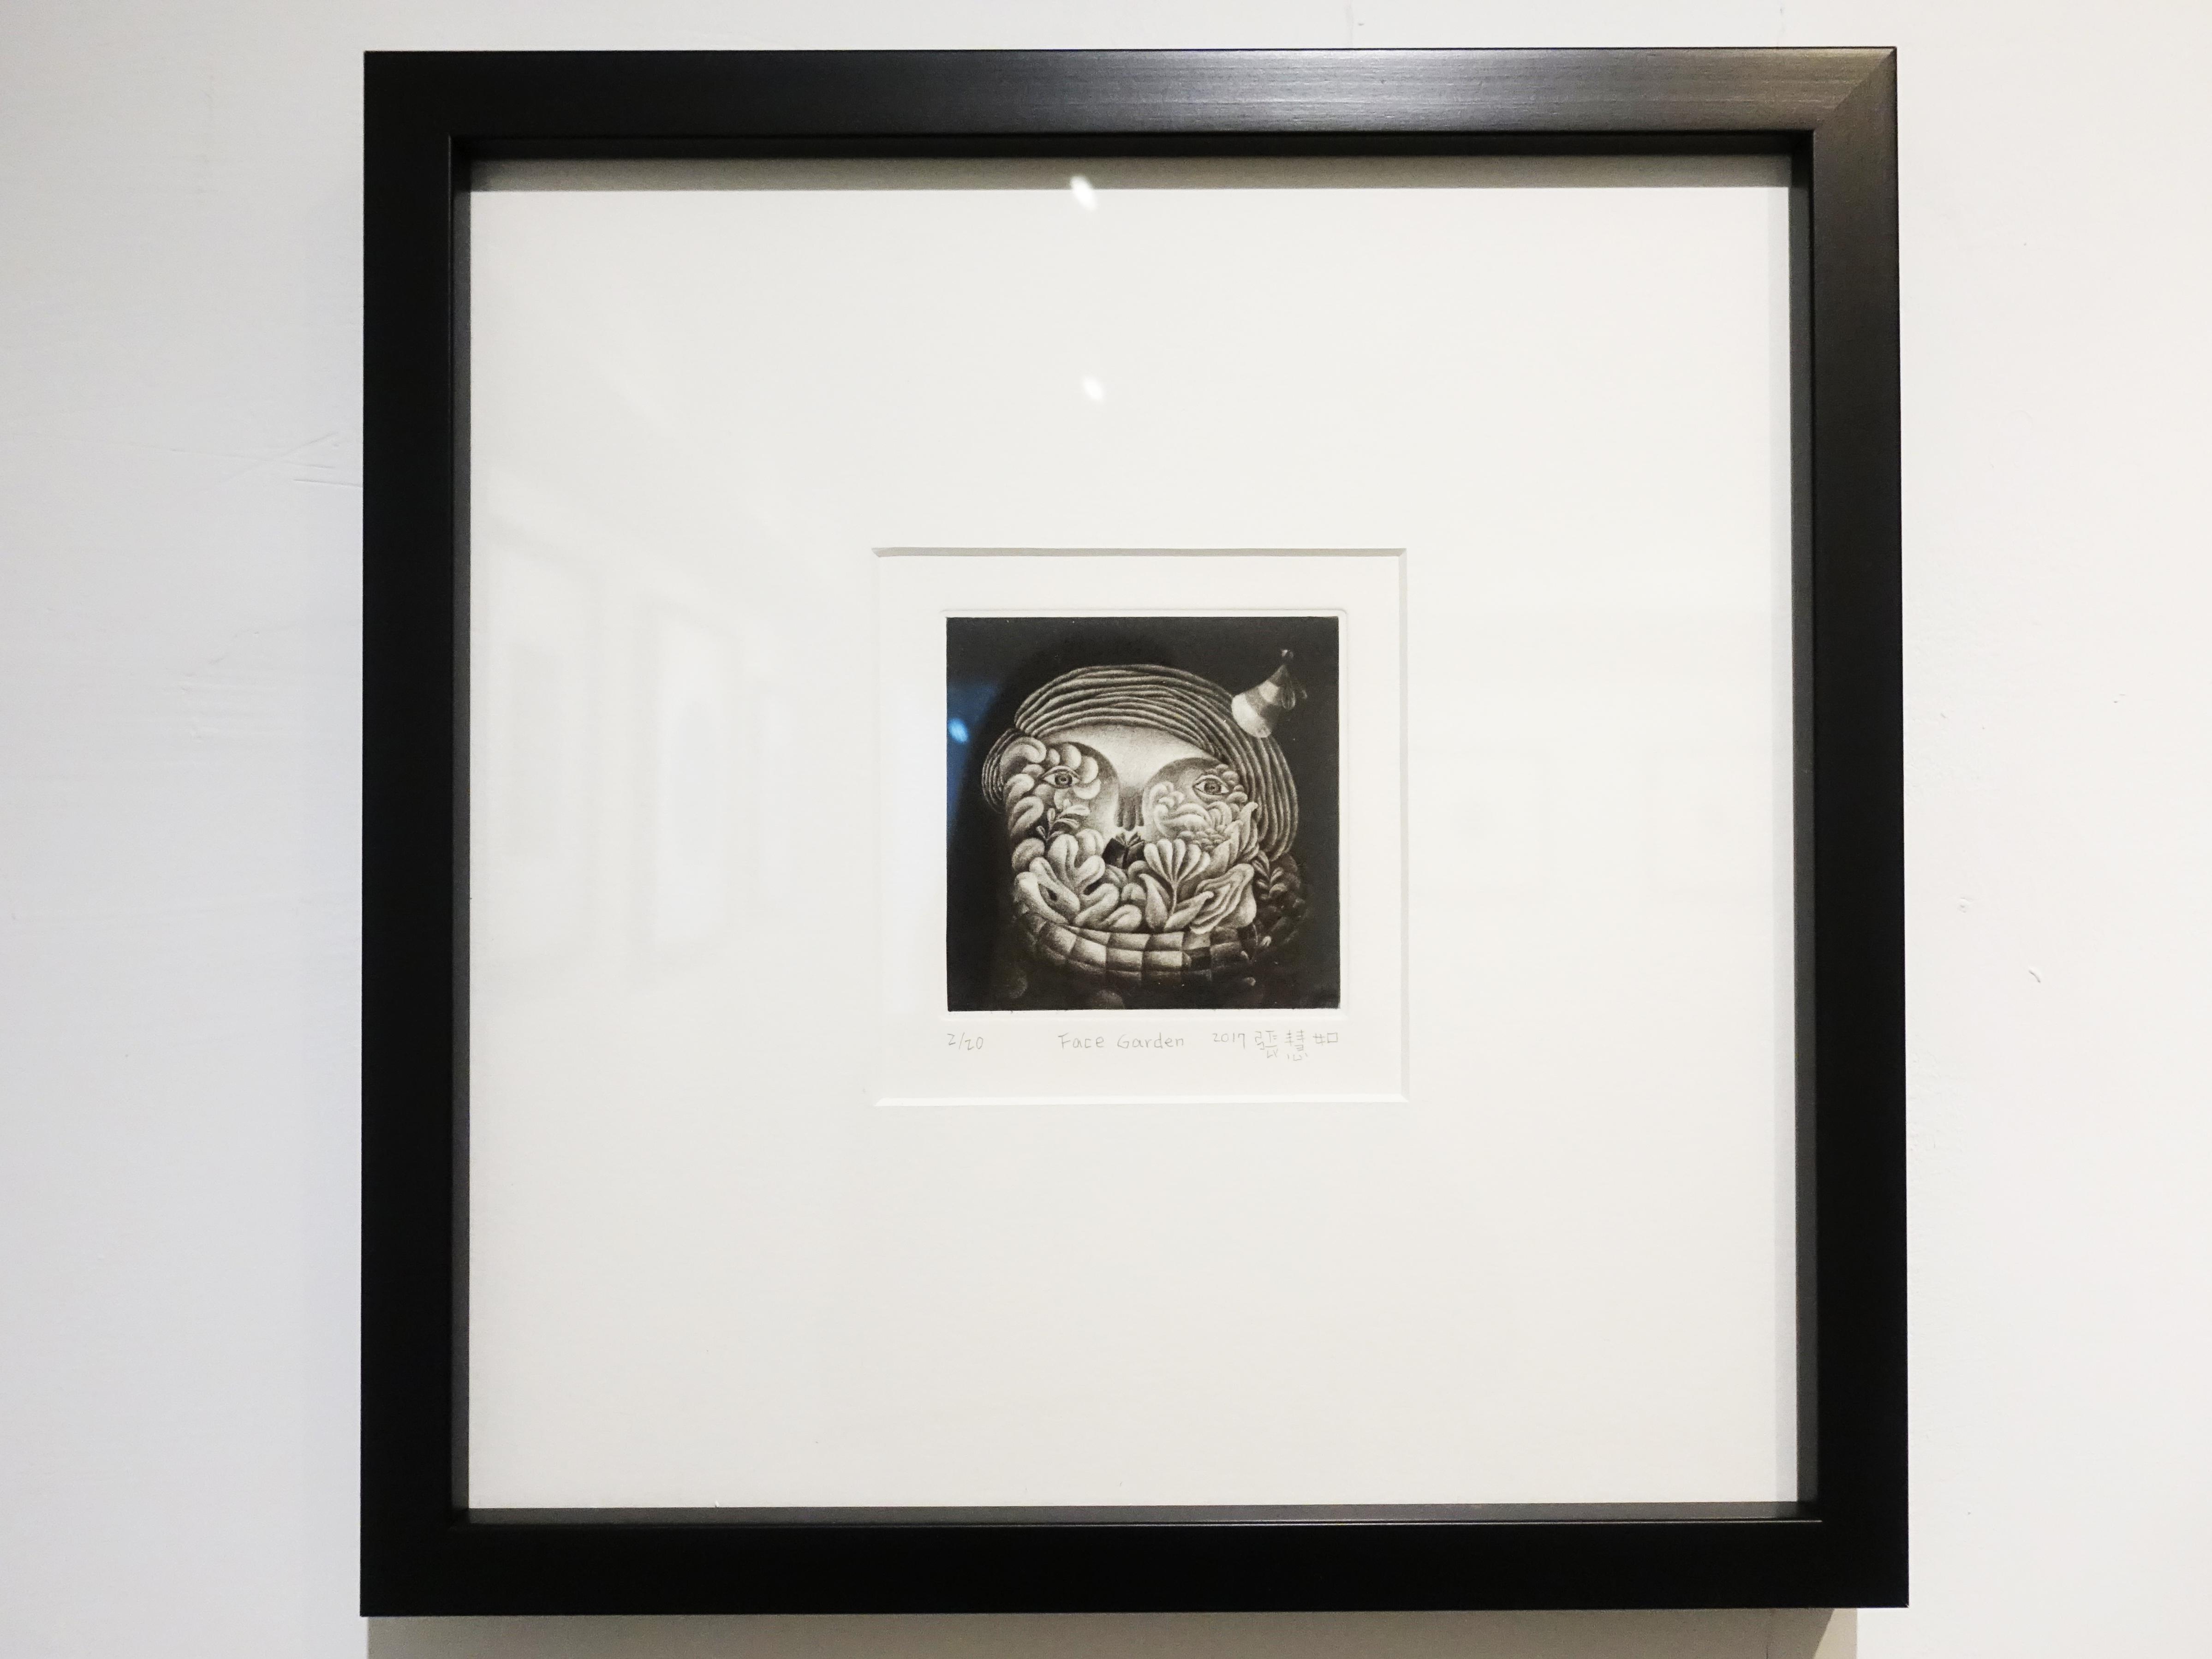 張慧如,《Face Garden》,10 x 10 cm,美柔丁2/20,2019。